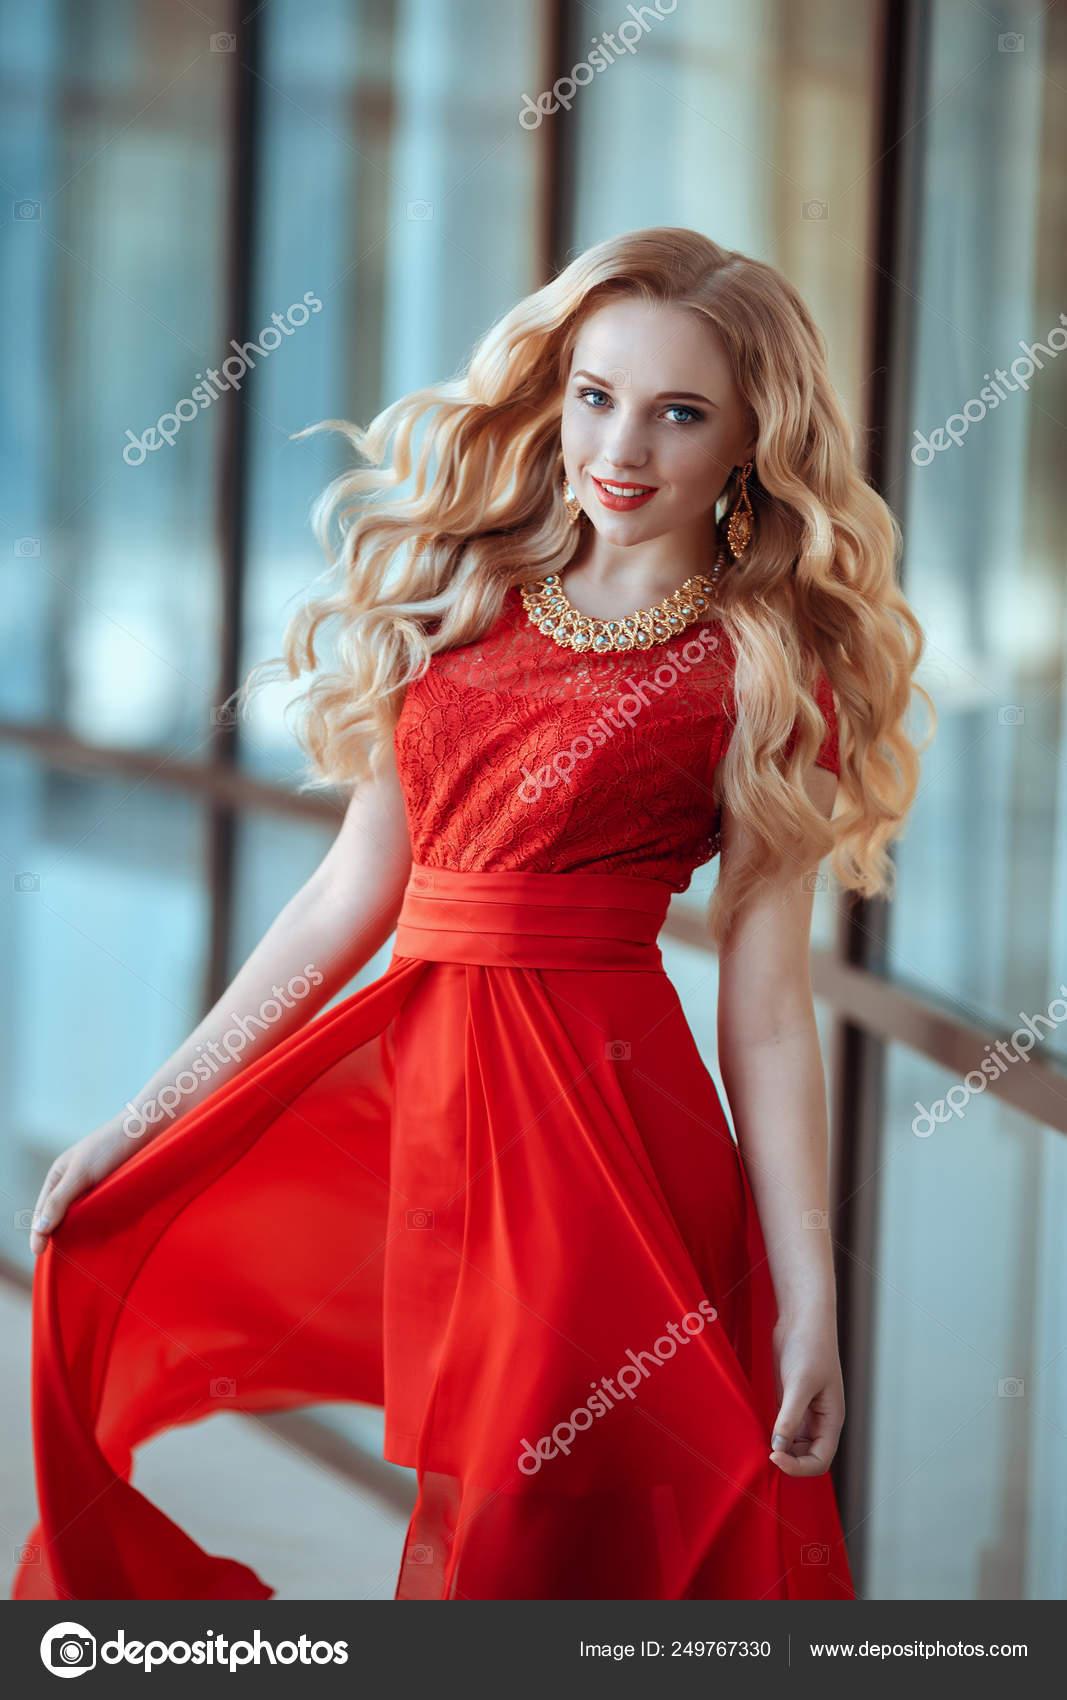 Portrait Of Stylish Beautiful Girl Wearing Short Red Dress Posing Or Walking At The Street Stock Photo C Selenittt 249767330